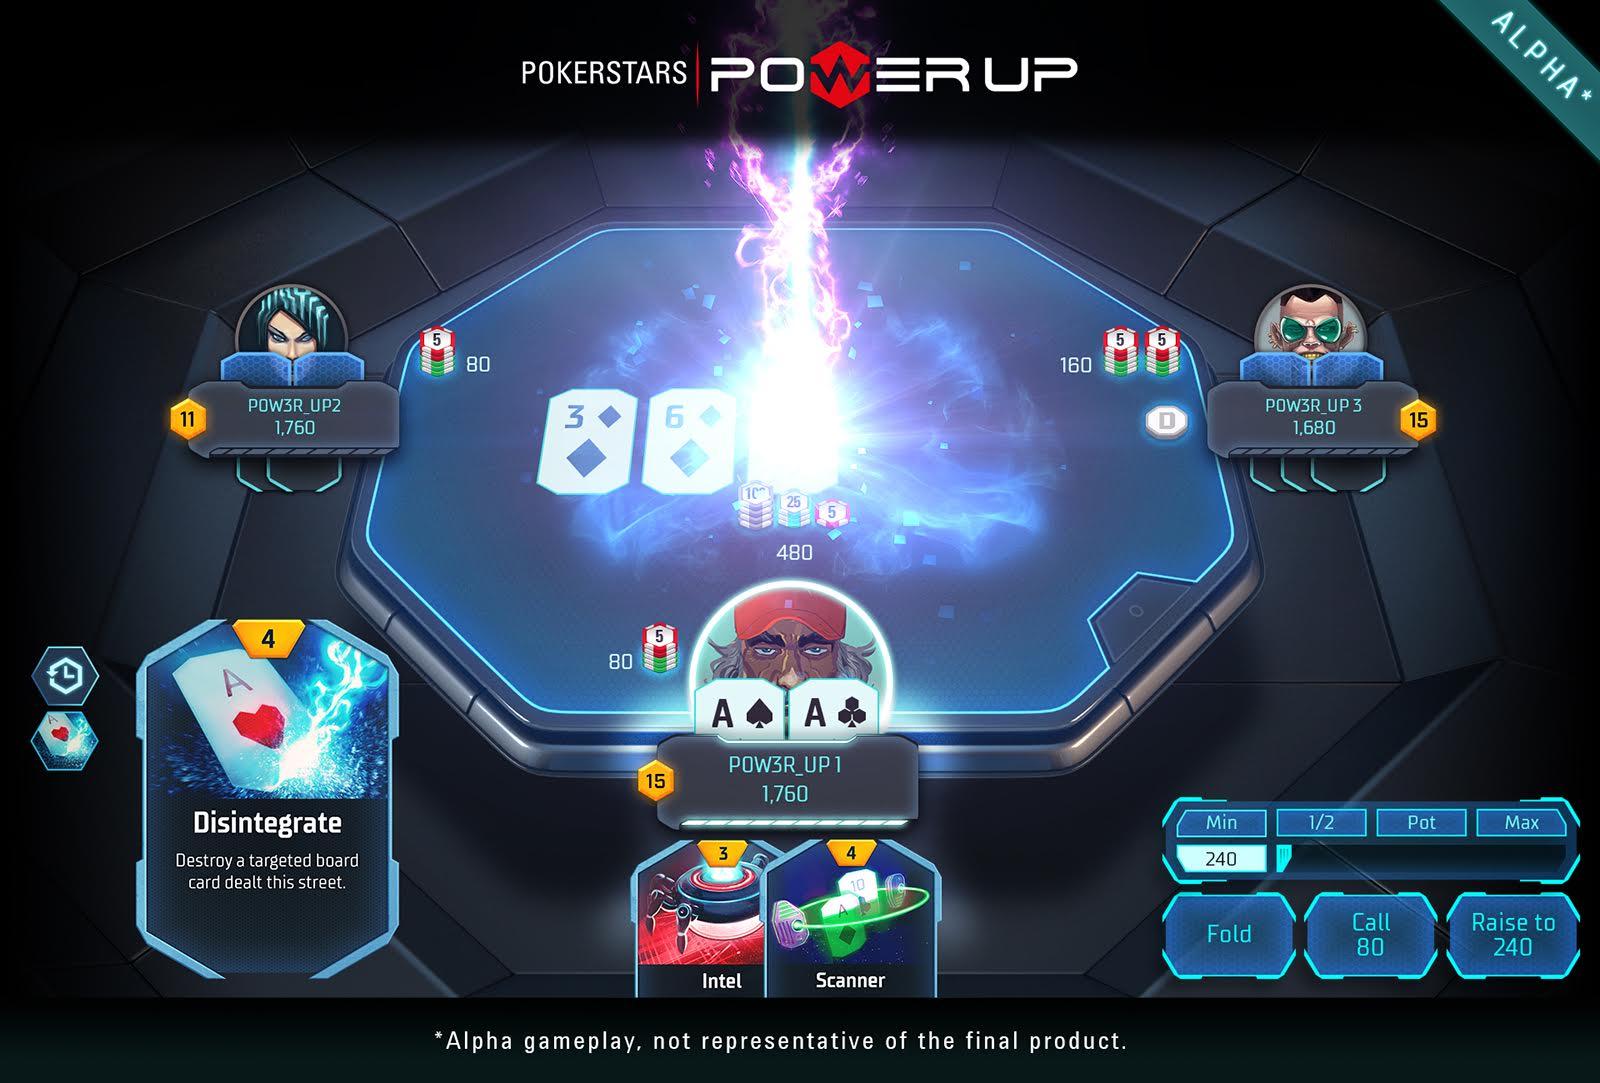 Pokerstars Power Up